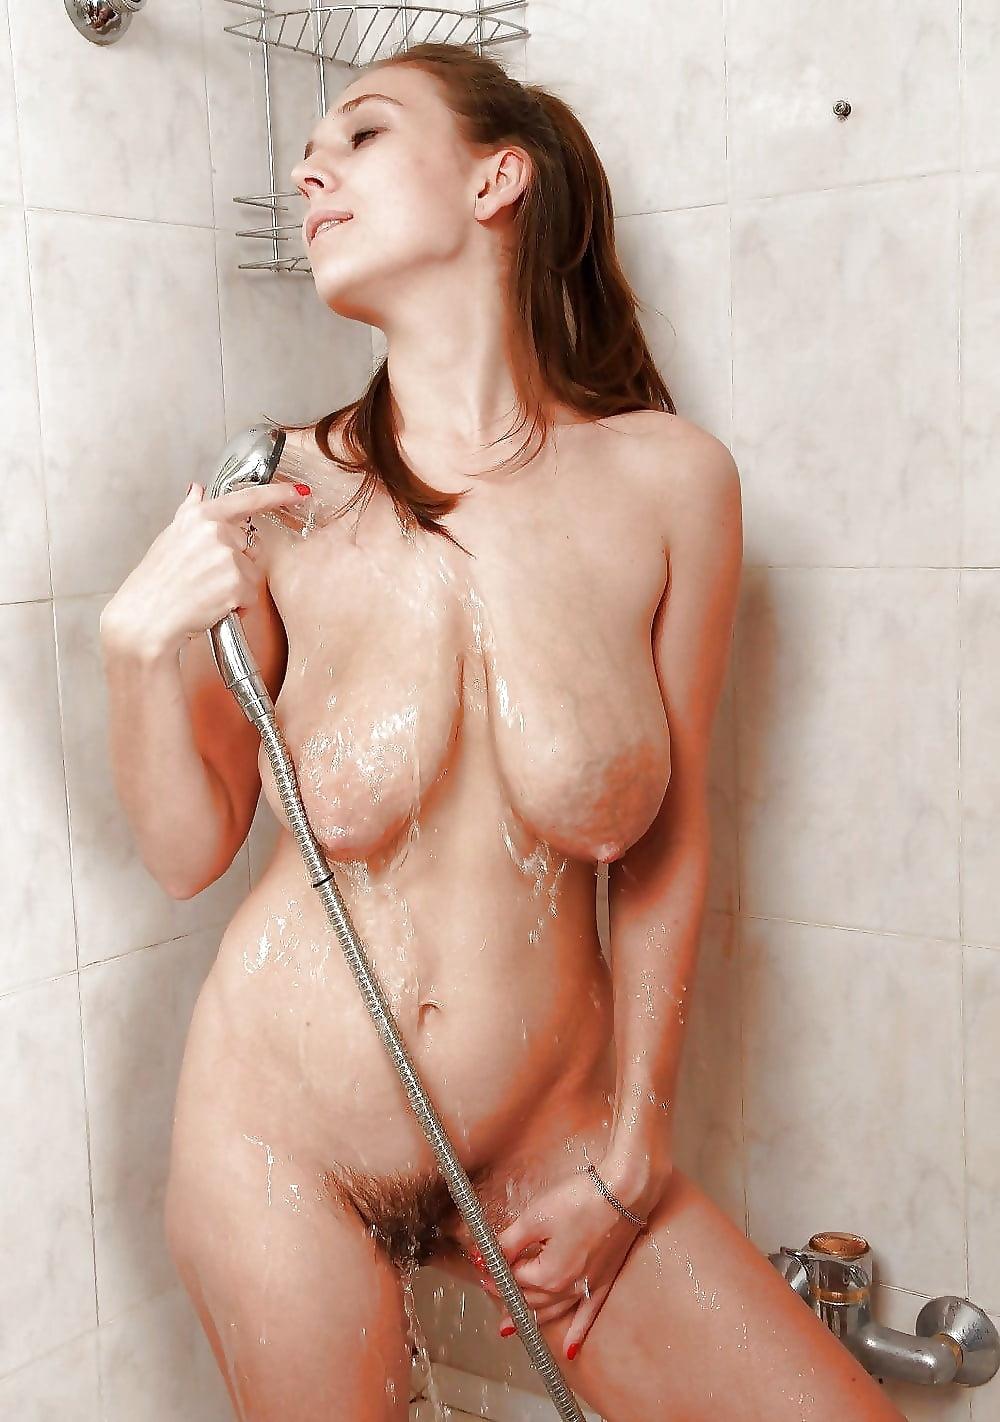 bigtits-shower-jizzhut-compilation-bisexual